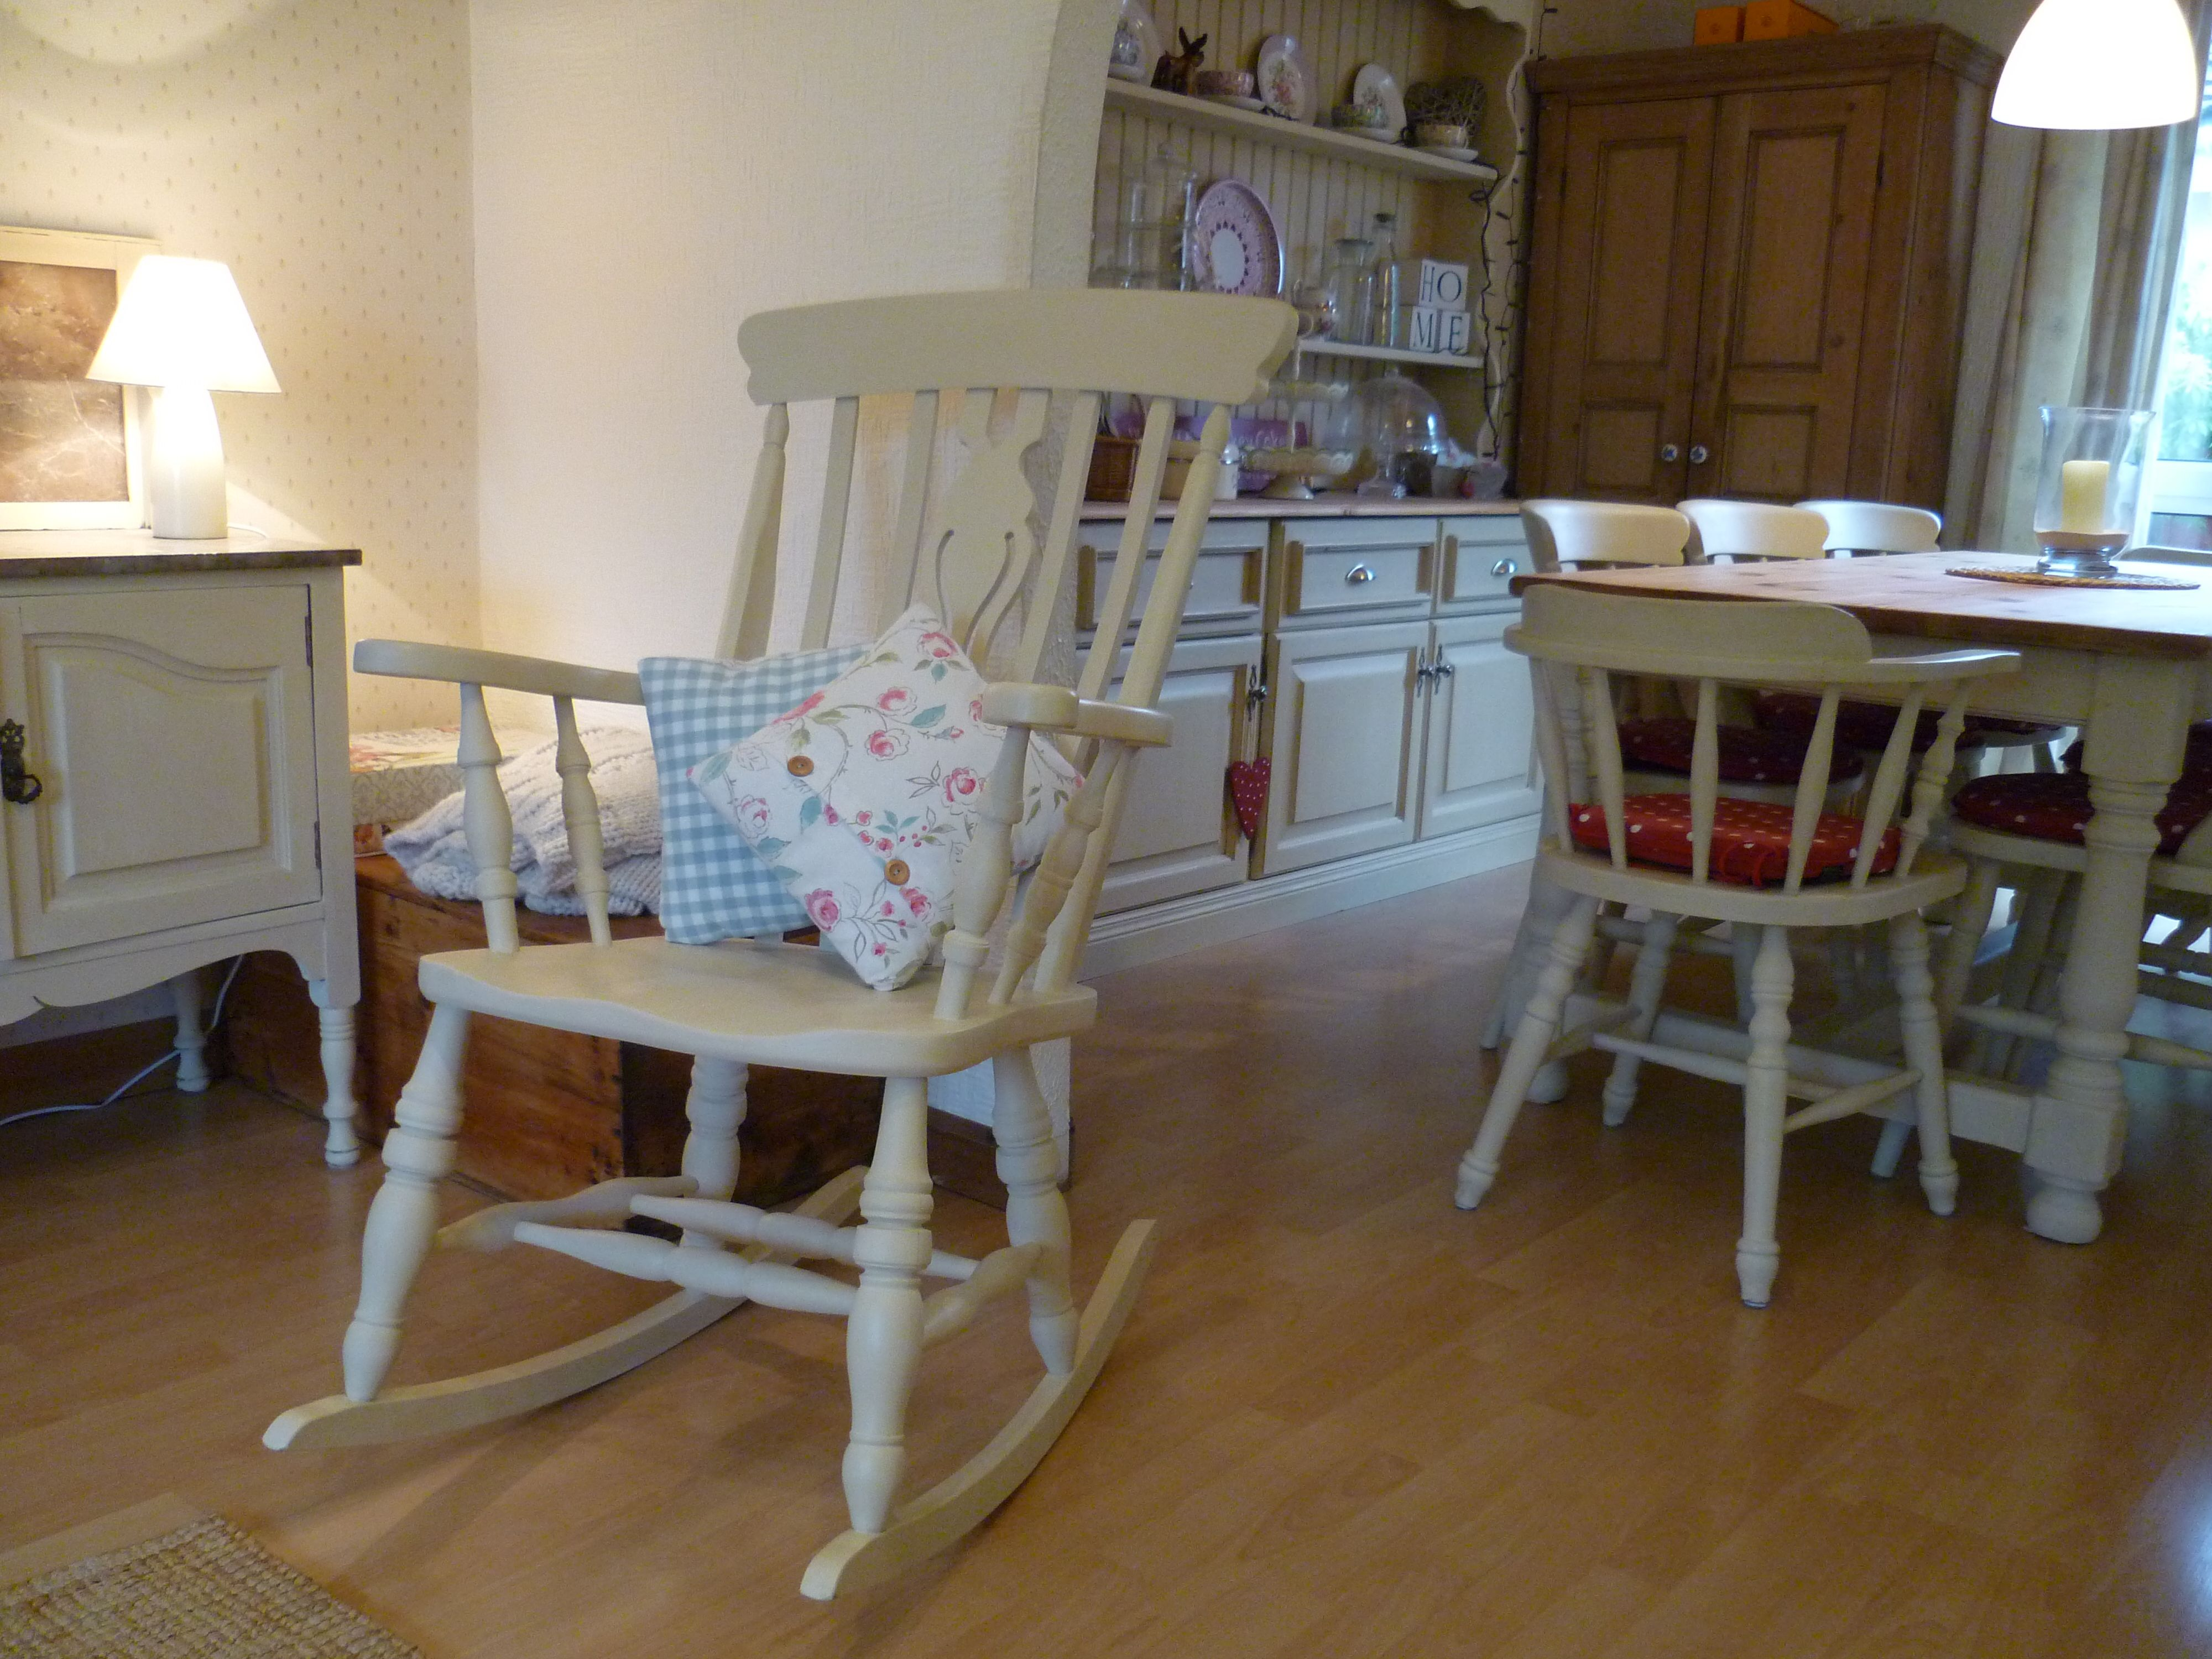 Shabby chic painted rocking chairs - Shabby Chic Painted Rocking Chair